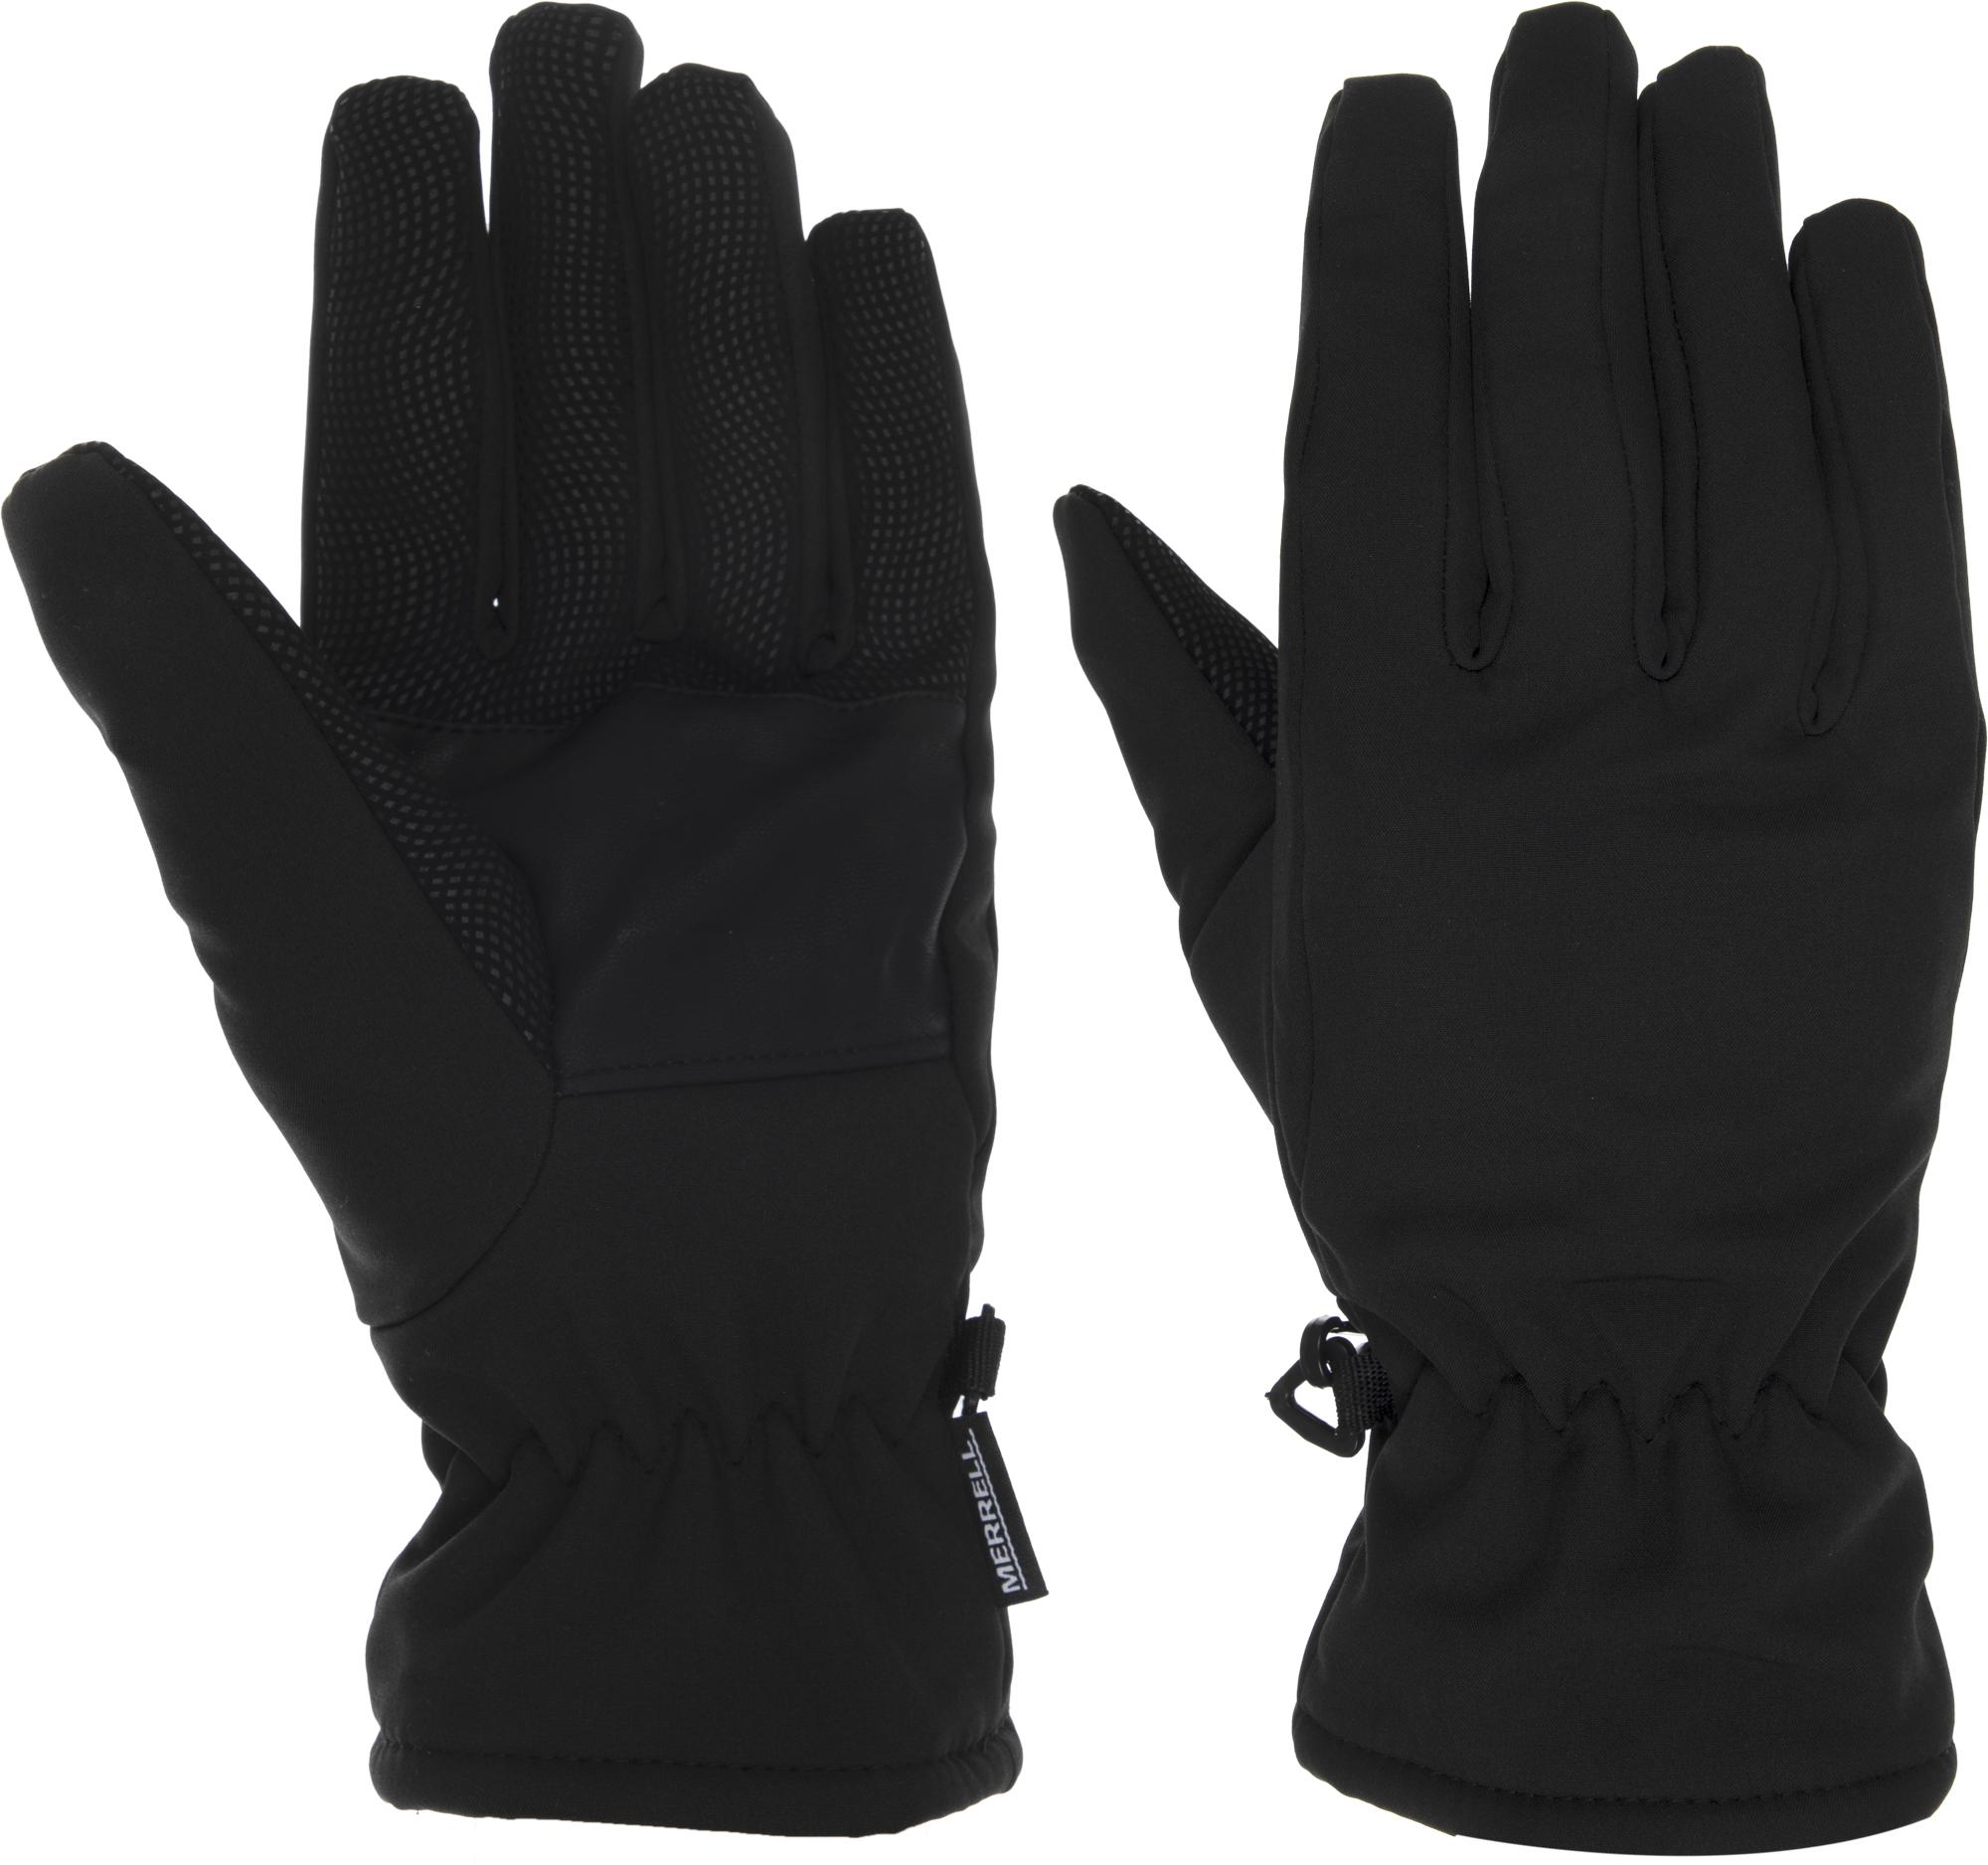 Merrell Перчатки Merrell, размер 9 перчатки jetasafety jle021 9 l12